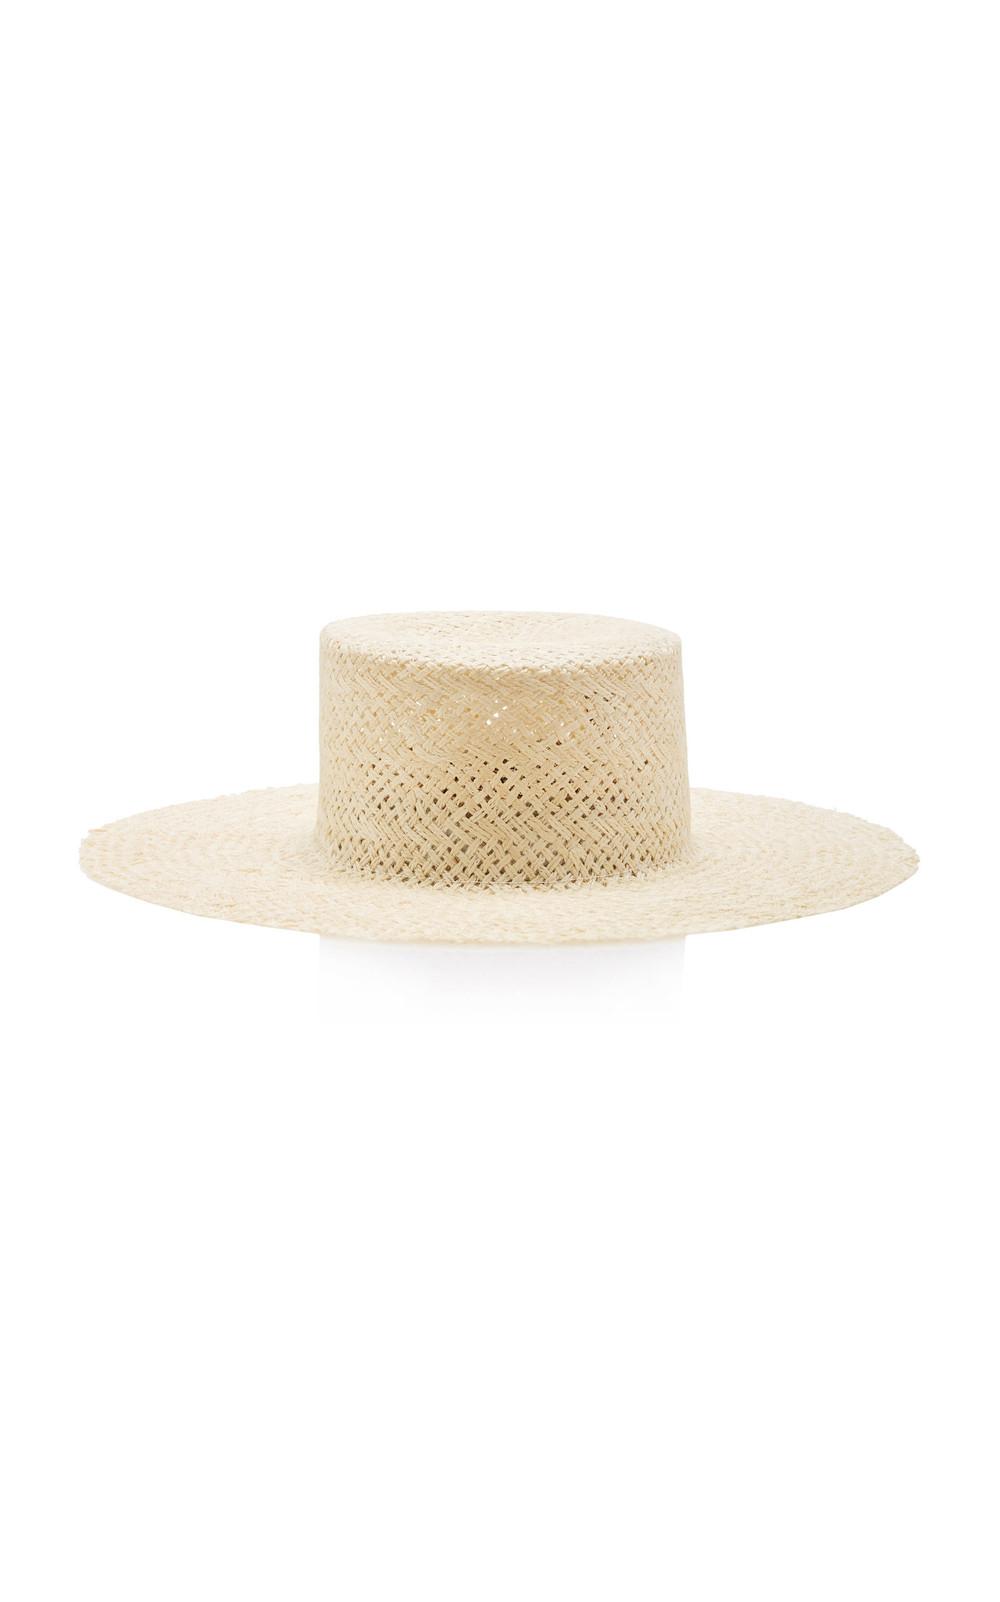 Janessa Leone Beatrice Straw Hat in neutral